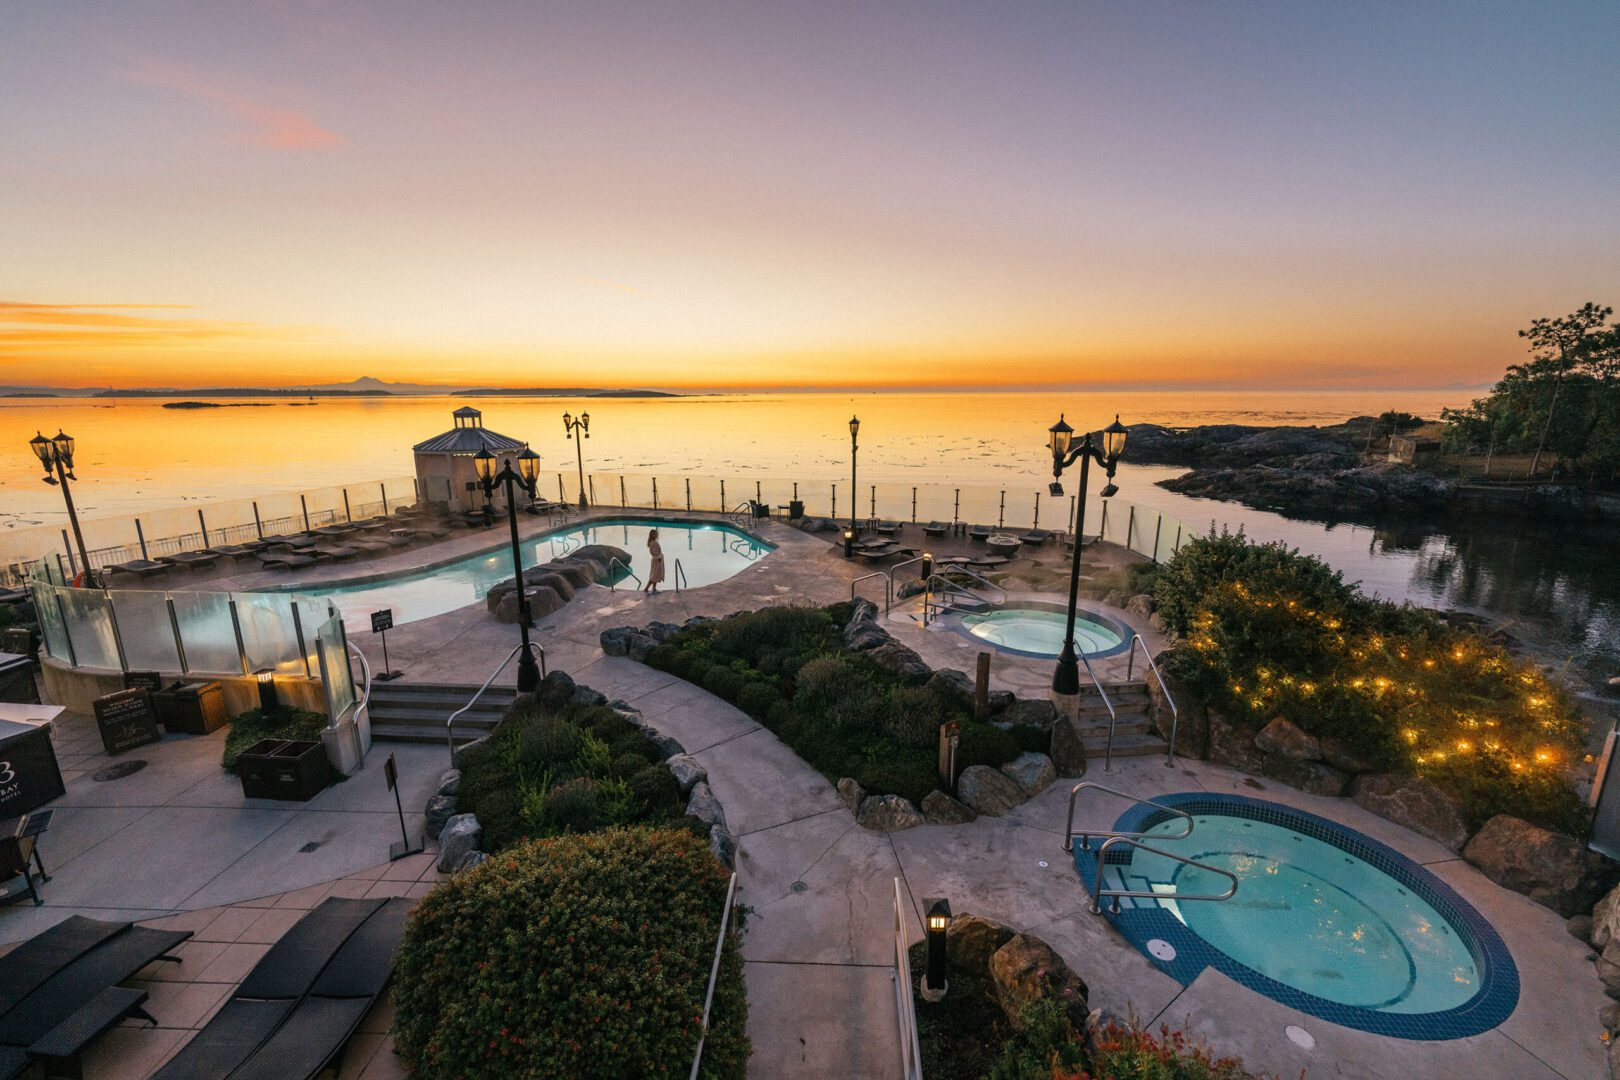 A sunrise over the pools at Oak Bay Beach Hotel